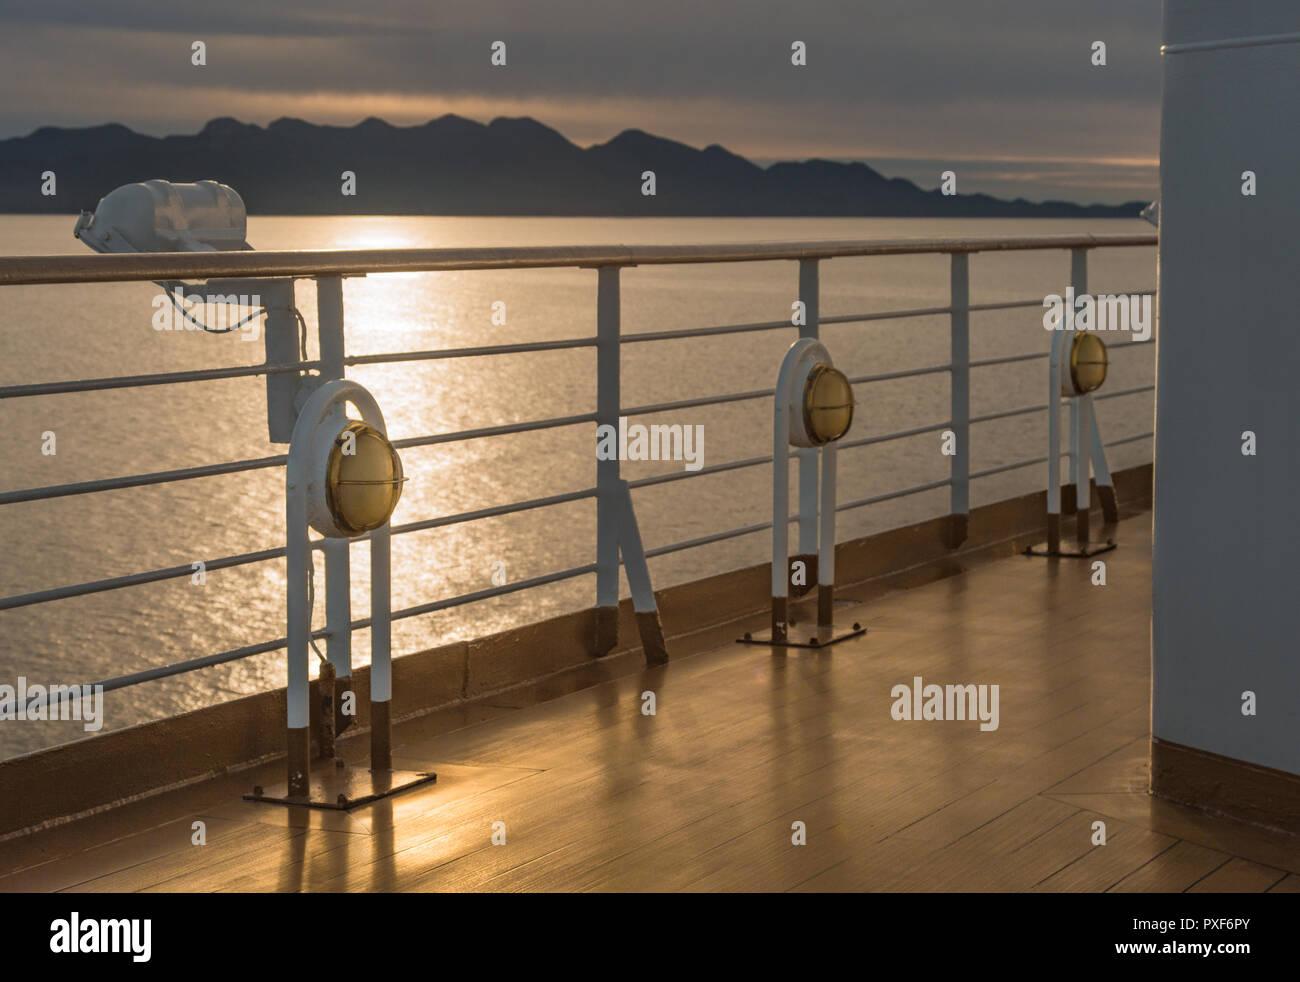 Three Nautical cruise ship deck walkway metal and brass exterior marine light fixtures. - Stock Image